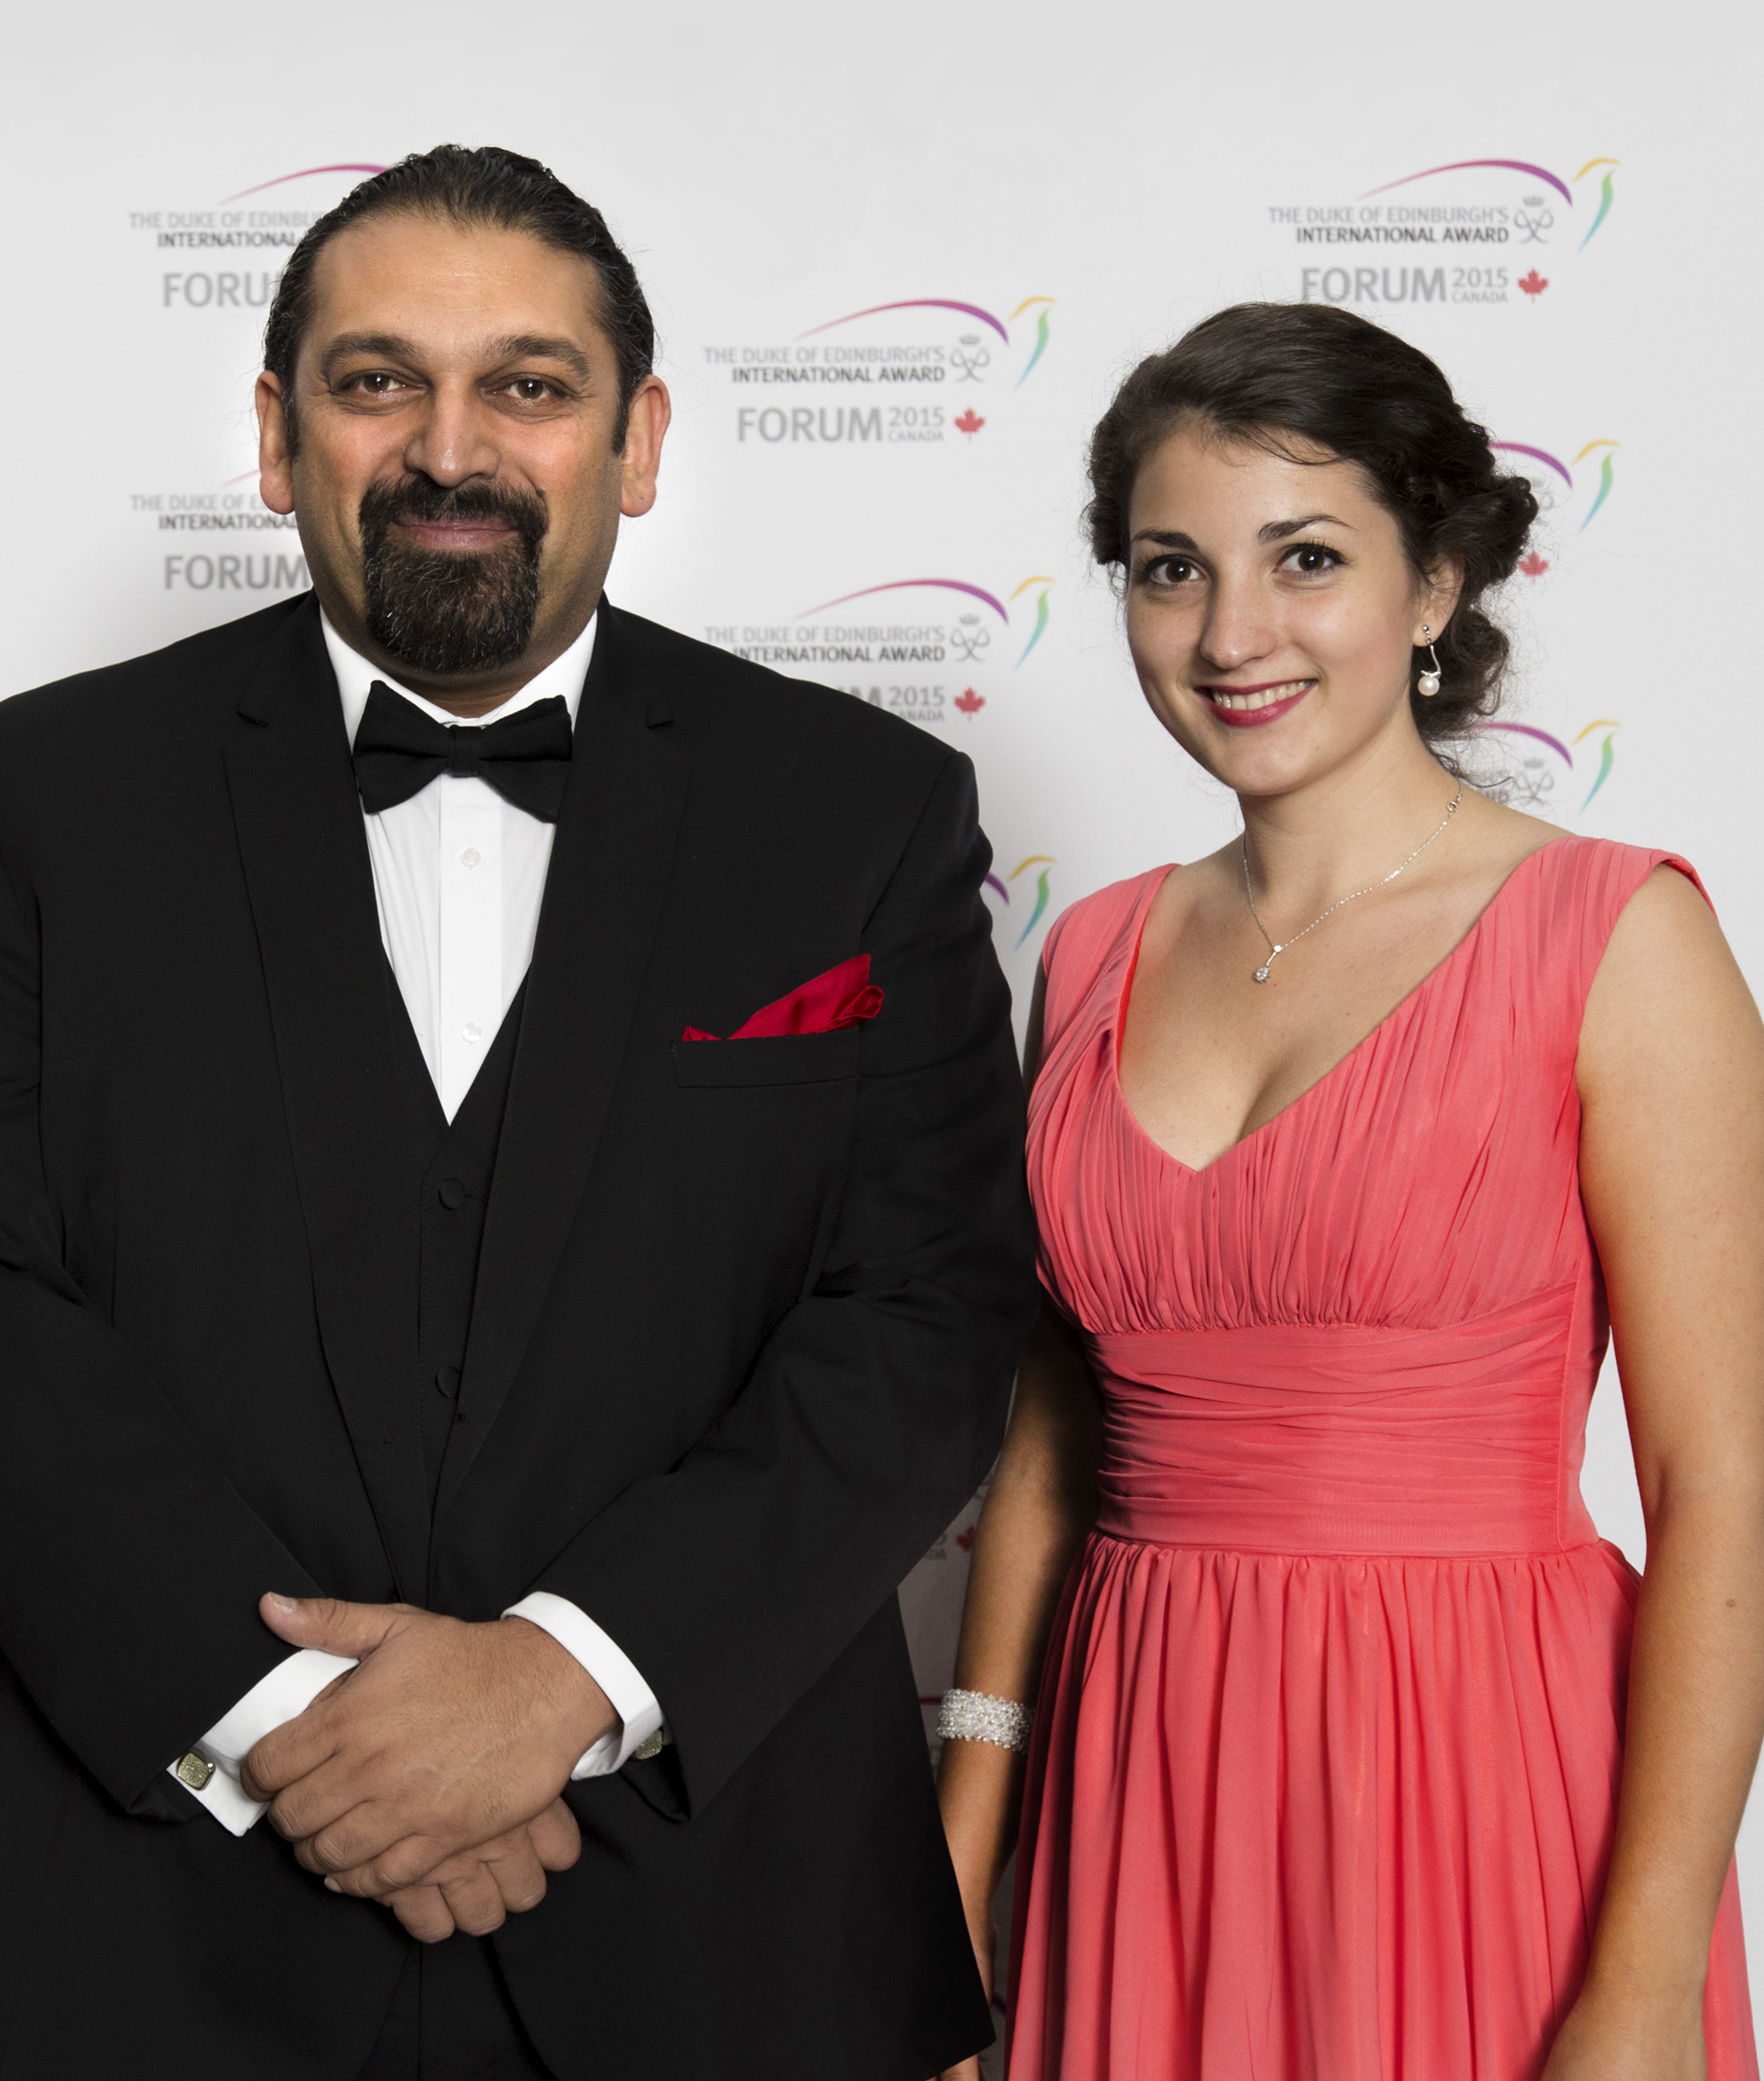 Interviu cu Shajjad Rizvi ȘI Mihaela Mariș – The Duke of Edinburgh's International Award Romania ^_^ https://issuu.com/performance-rau/docs/nr-55_nov-dec_2016/16